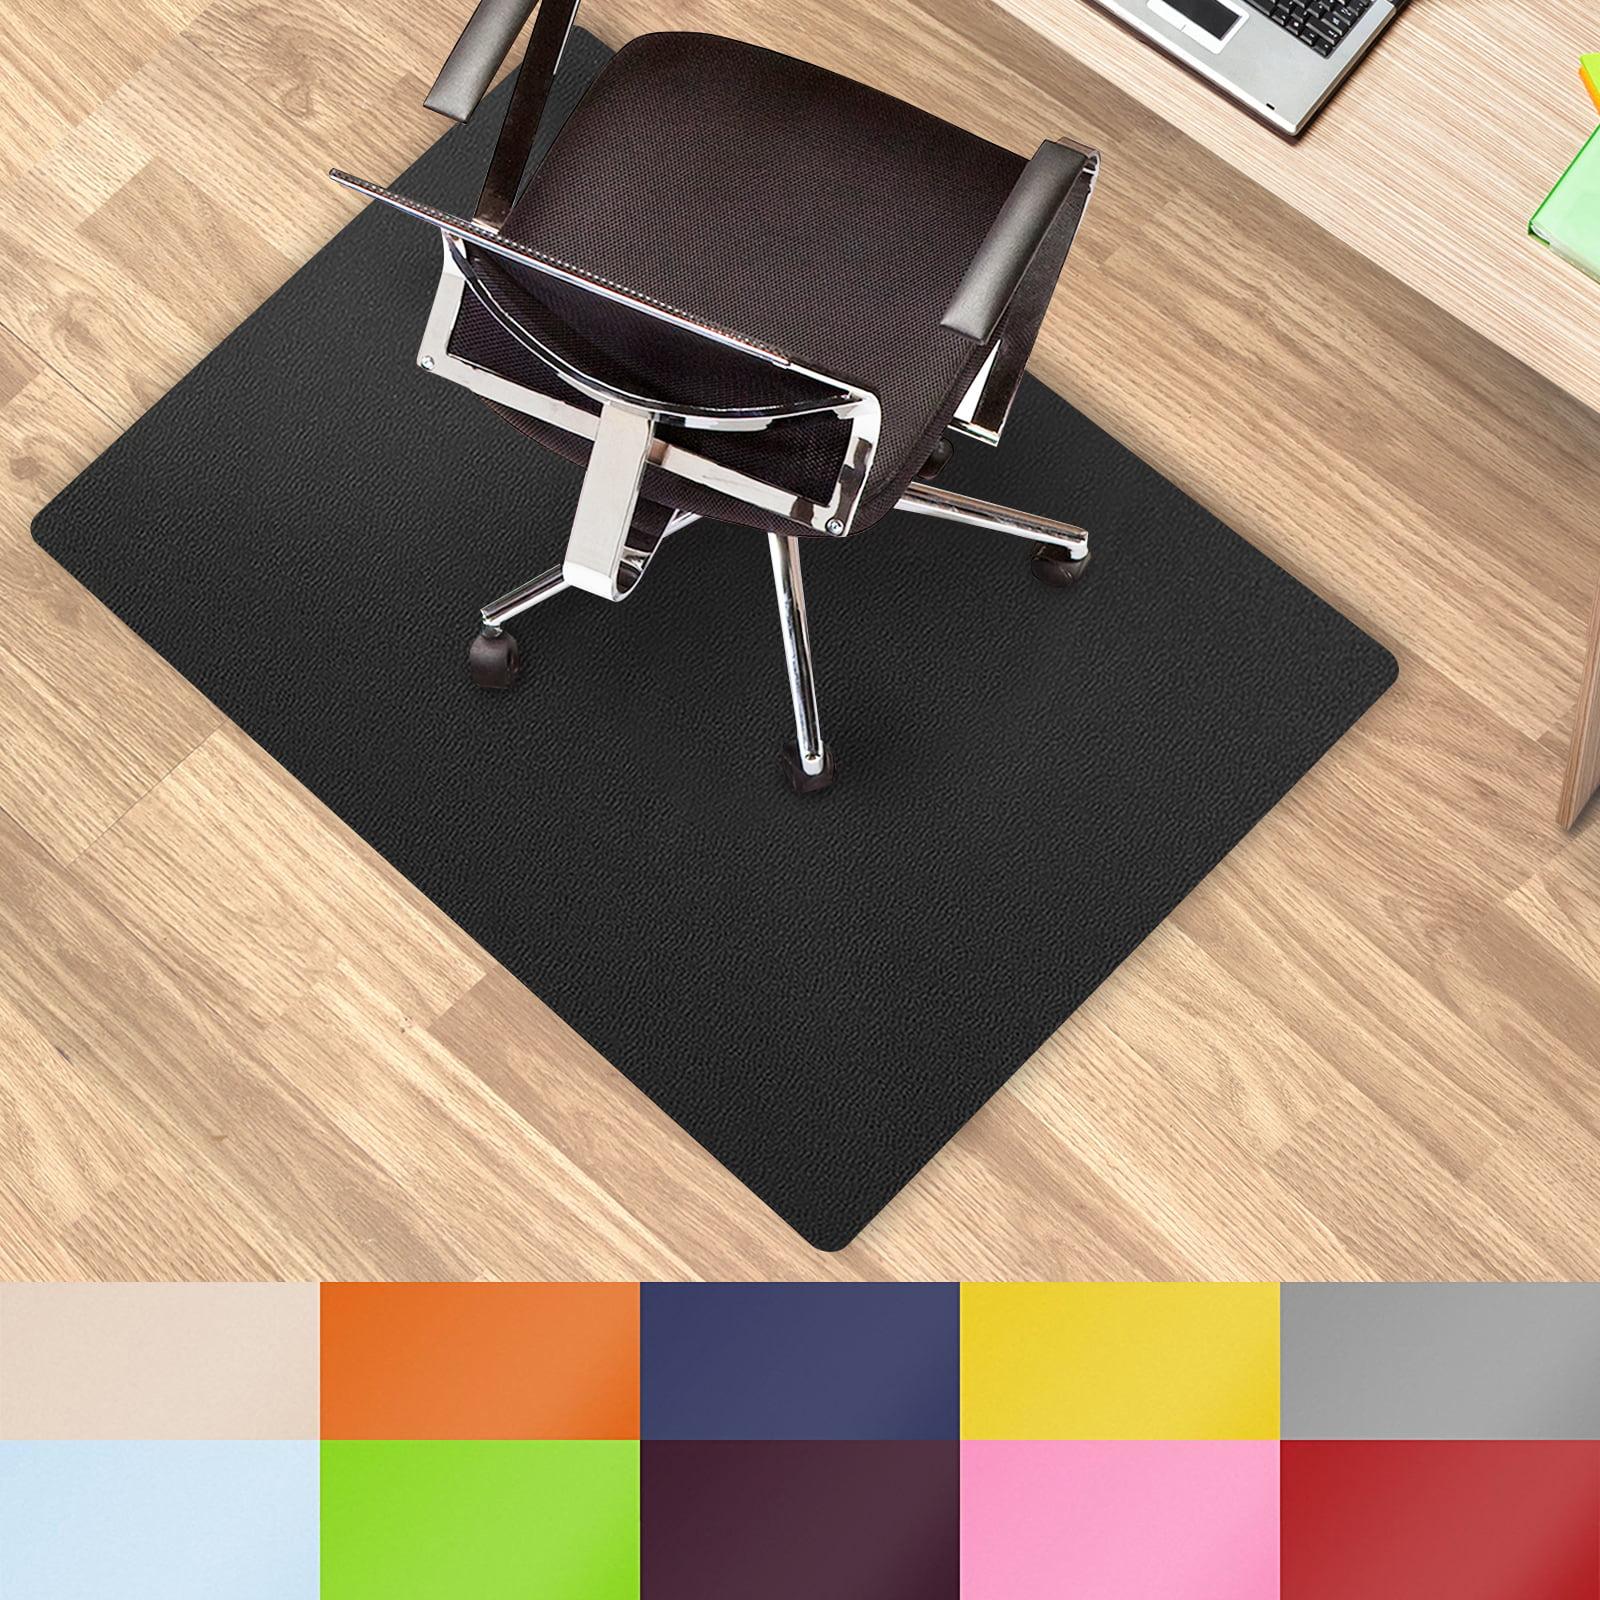 Chair Mat For Hard Floors Polypropylene Chair Floor